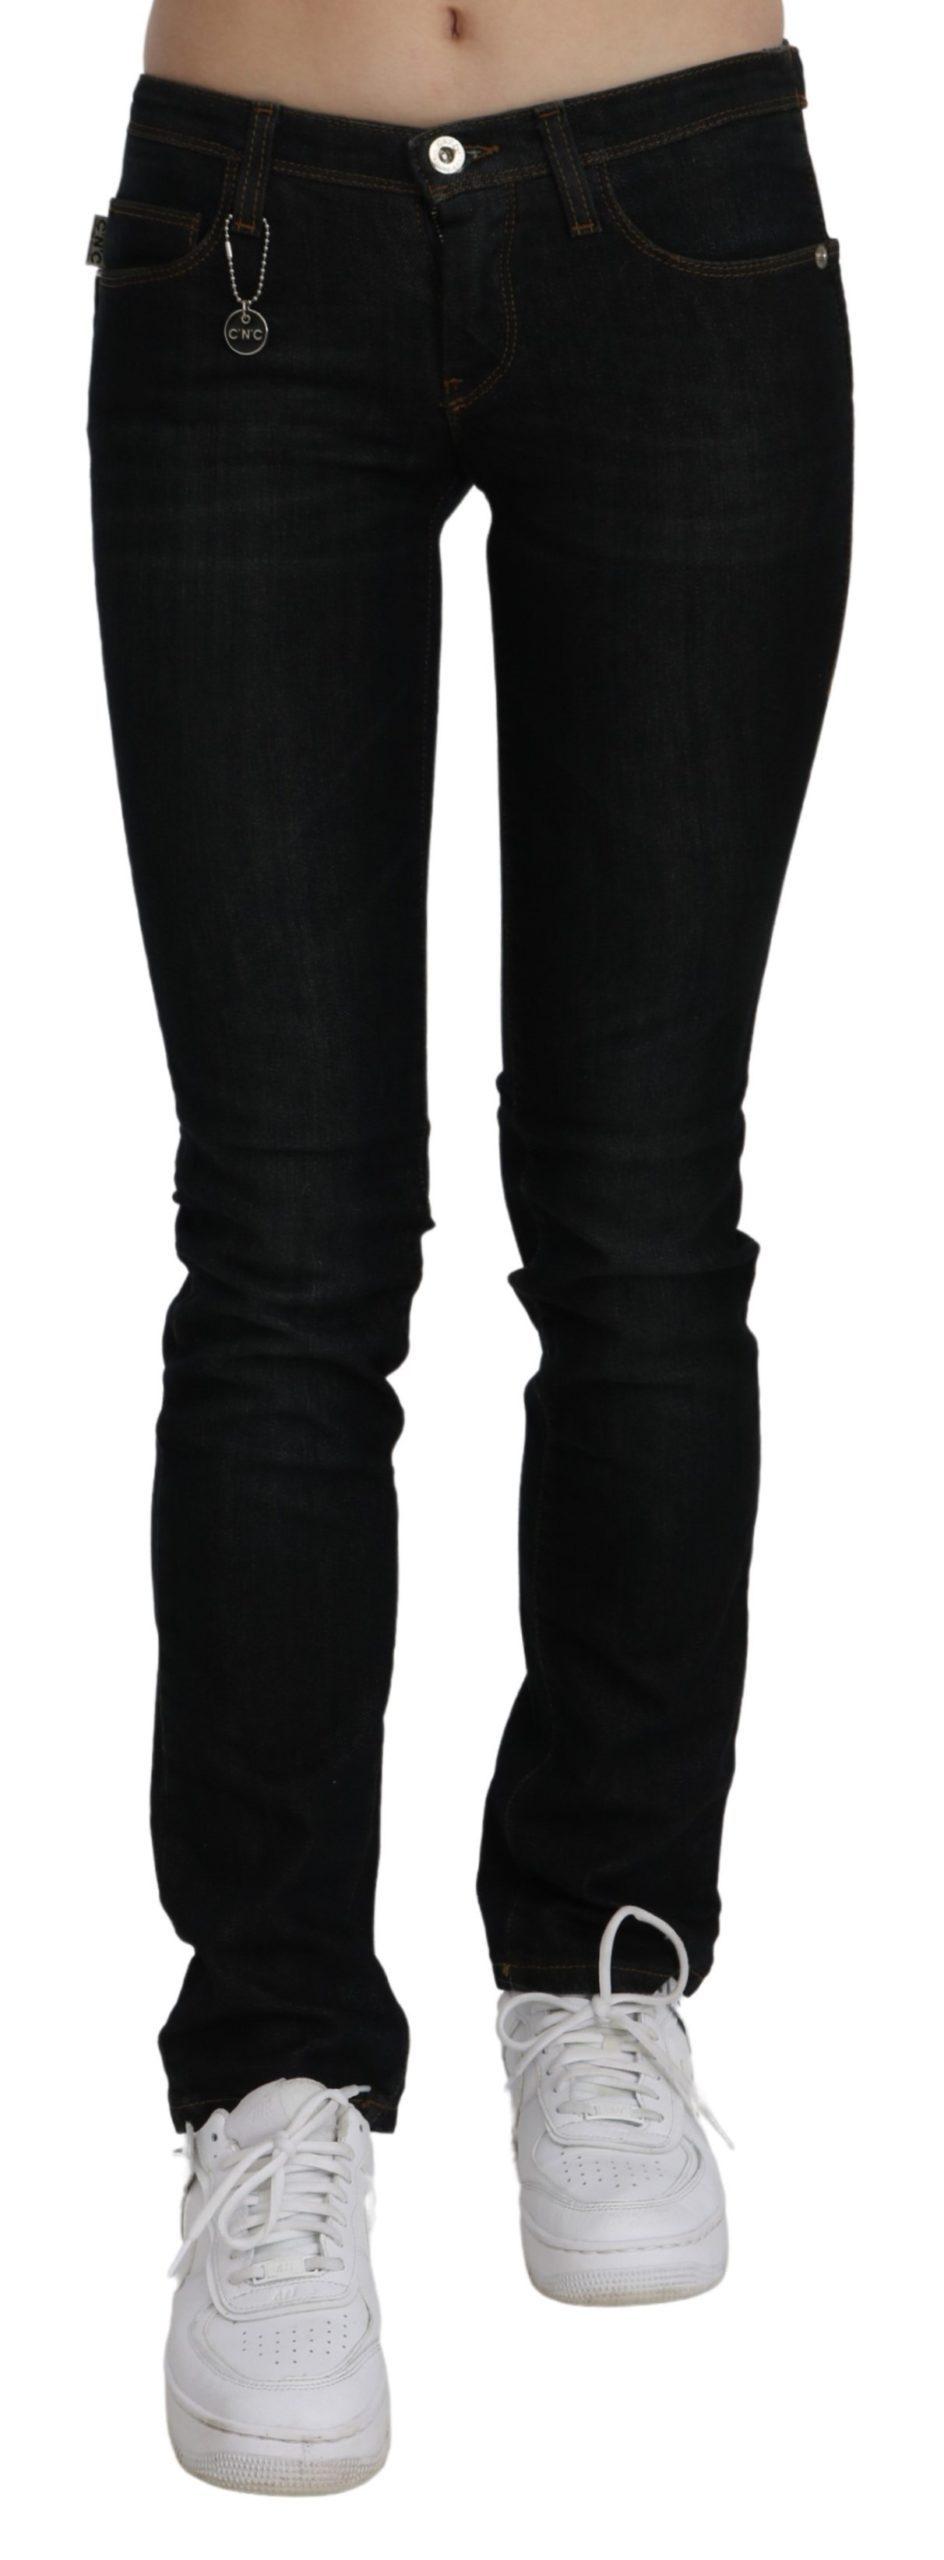 Costume National Women's Mid Waist Skinny Denim Cotton Jeans Black PAN70658 - W24